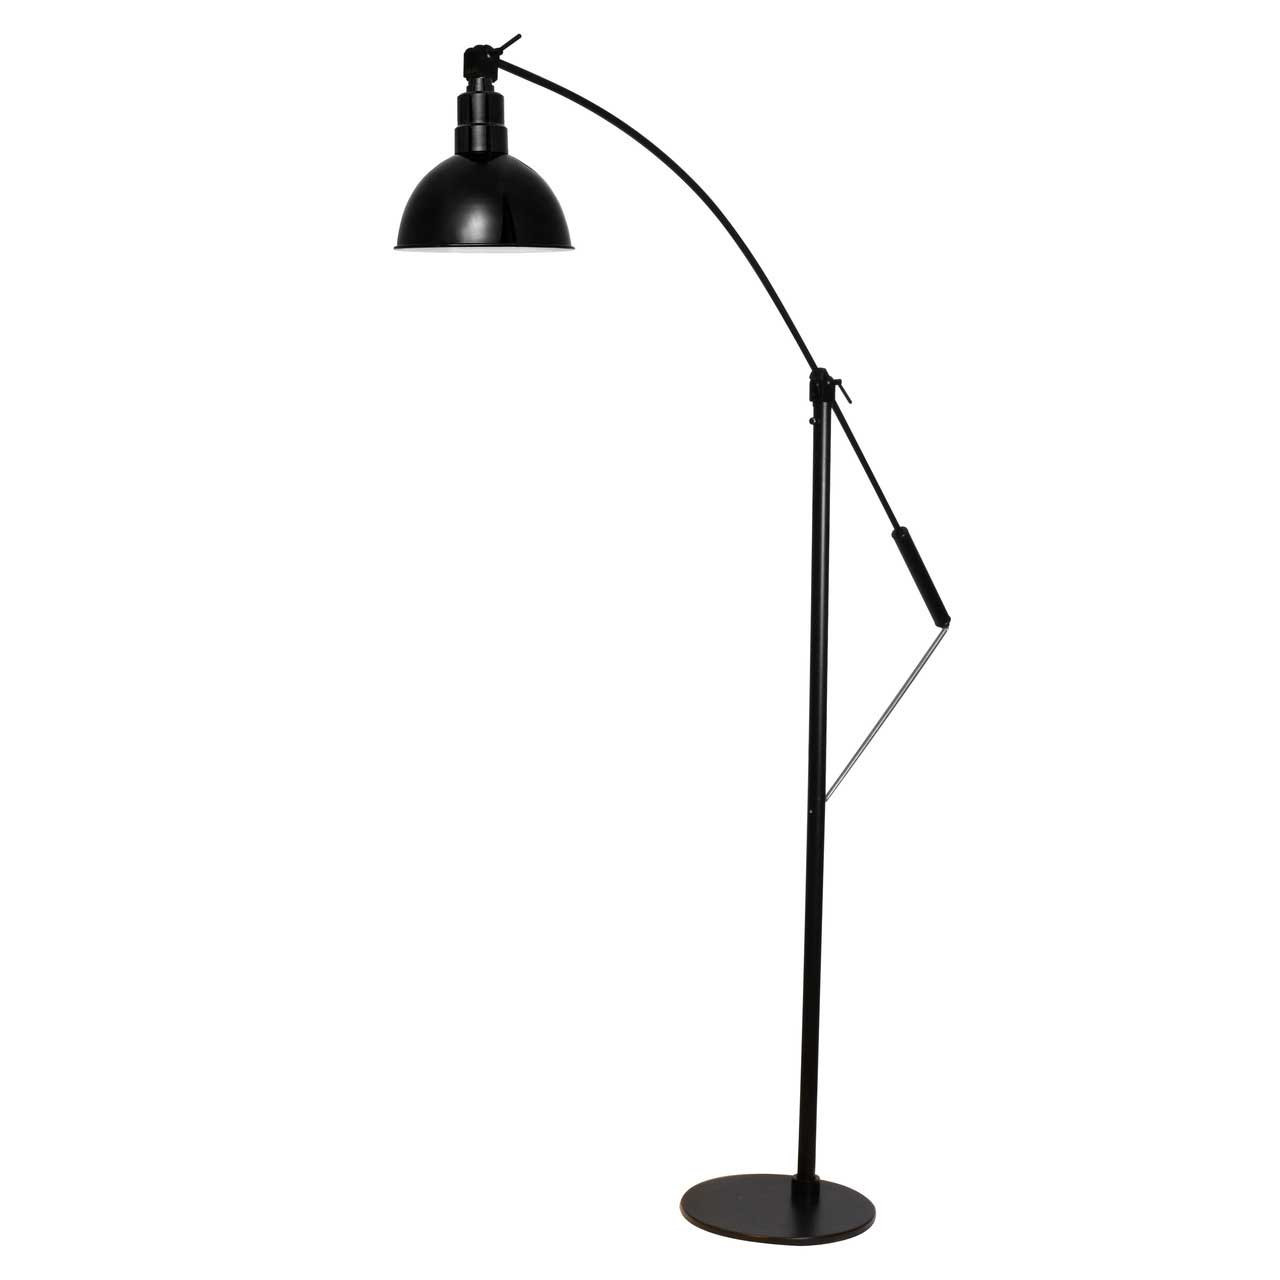 10 Blackspot Dimmable Floor Lamp Black